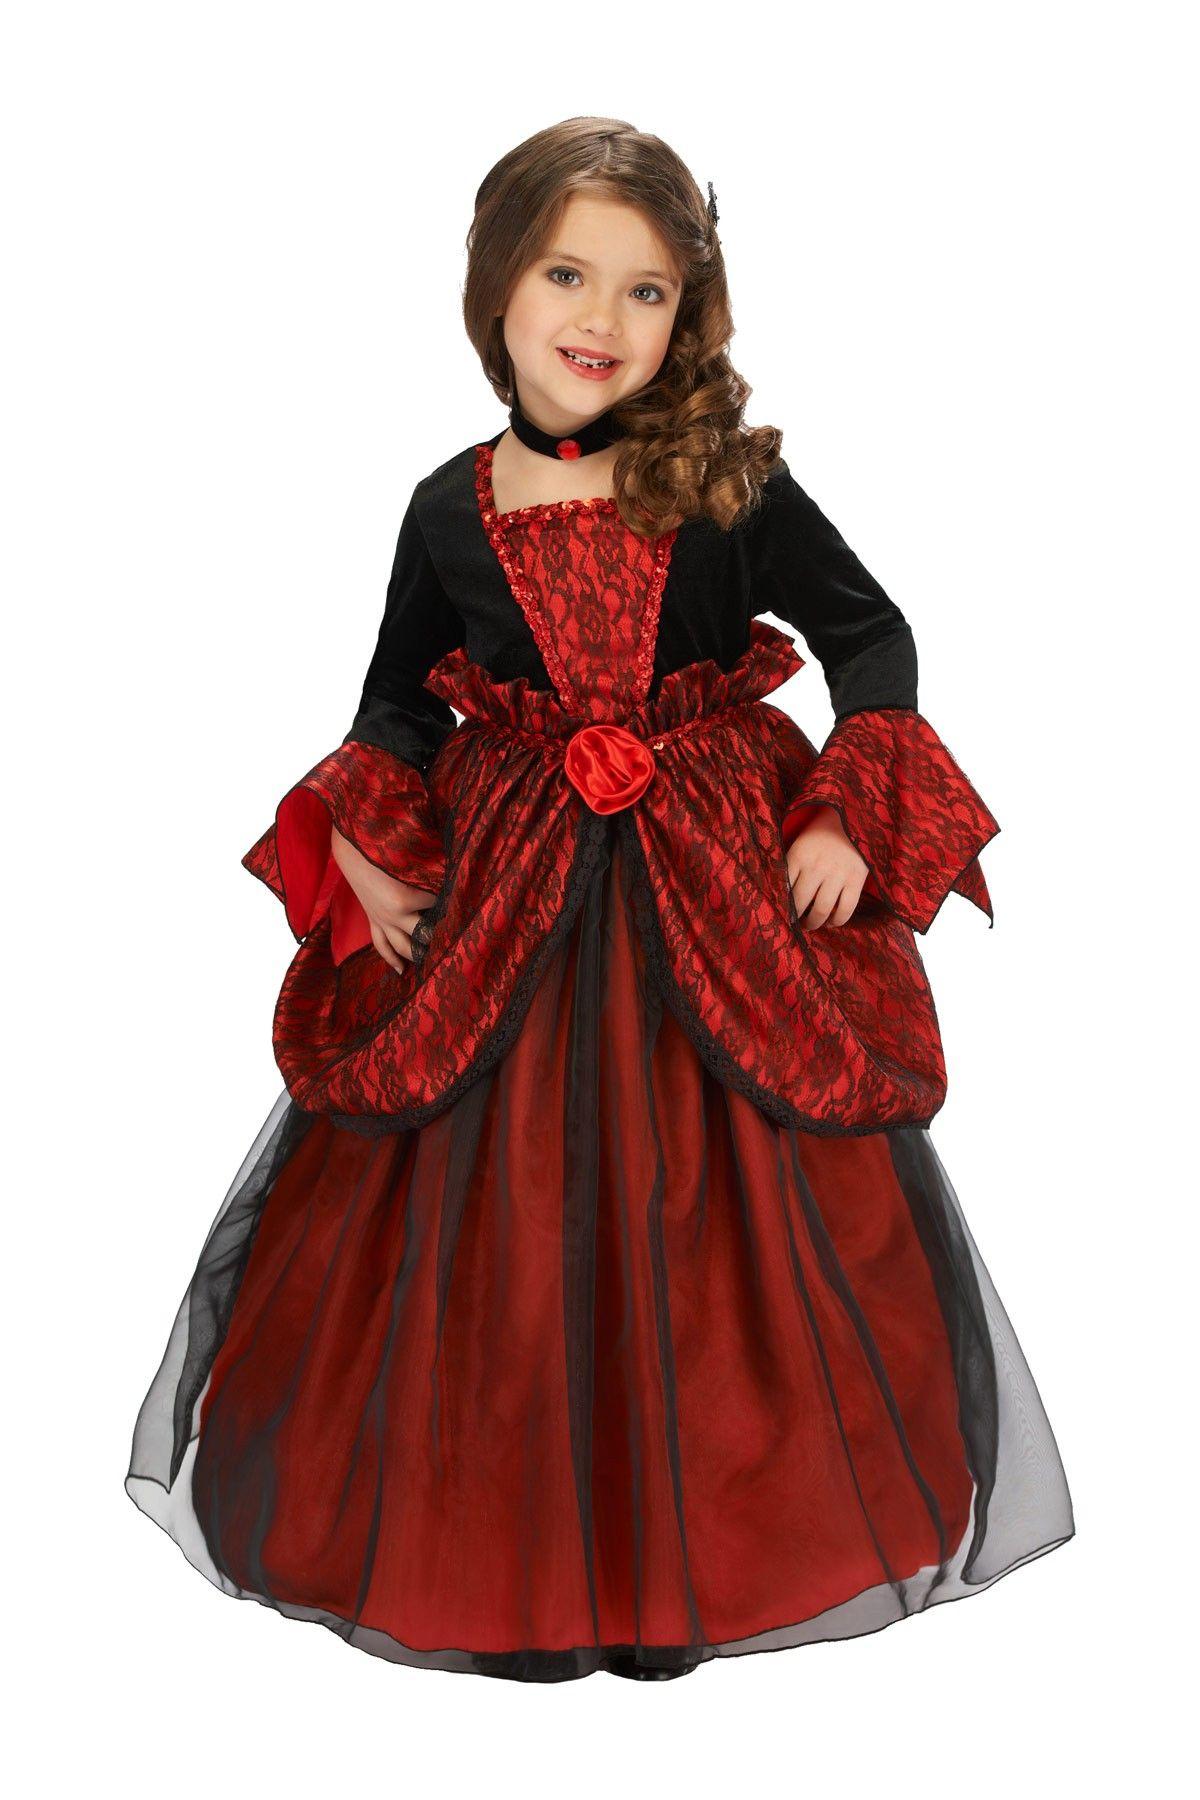 Vampire Princess Dress on HauteLook. Vampire Princess Dress on HauteLook Girls  Vampire Costume 7ebbf3227619